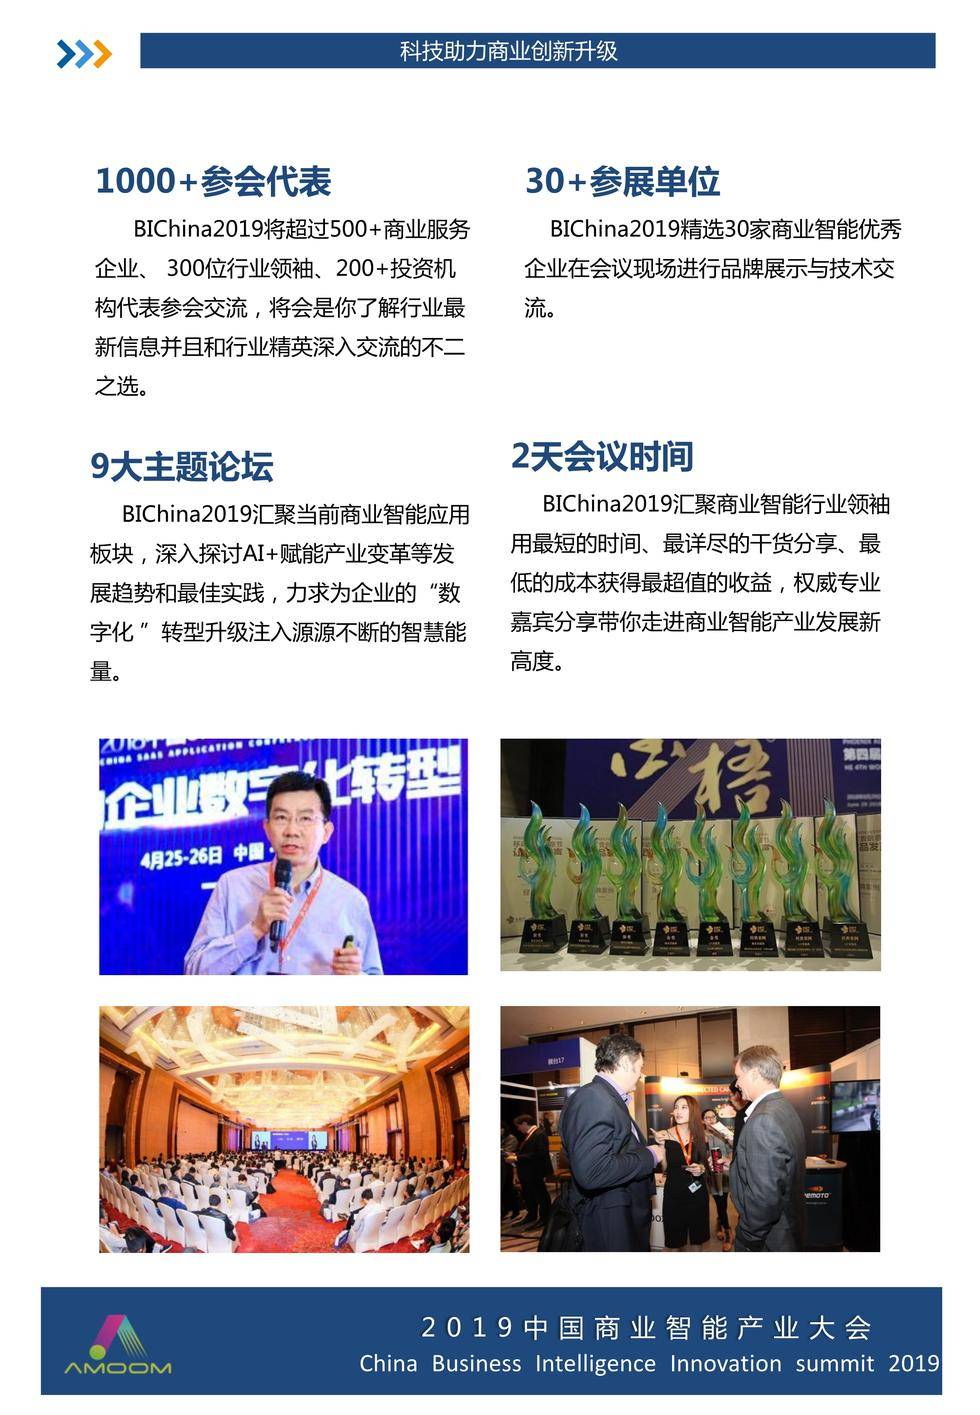 BIChina2019中国商业智能创新大会_3.jpg